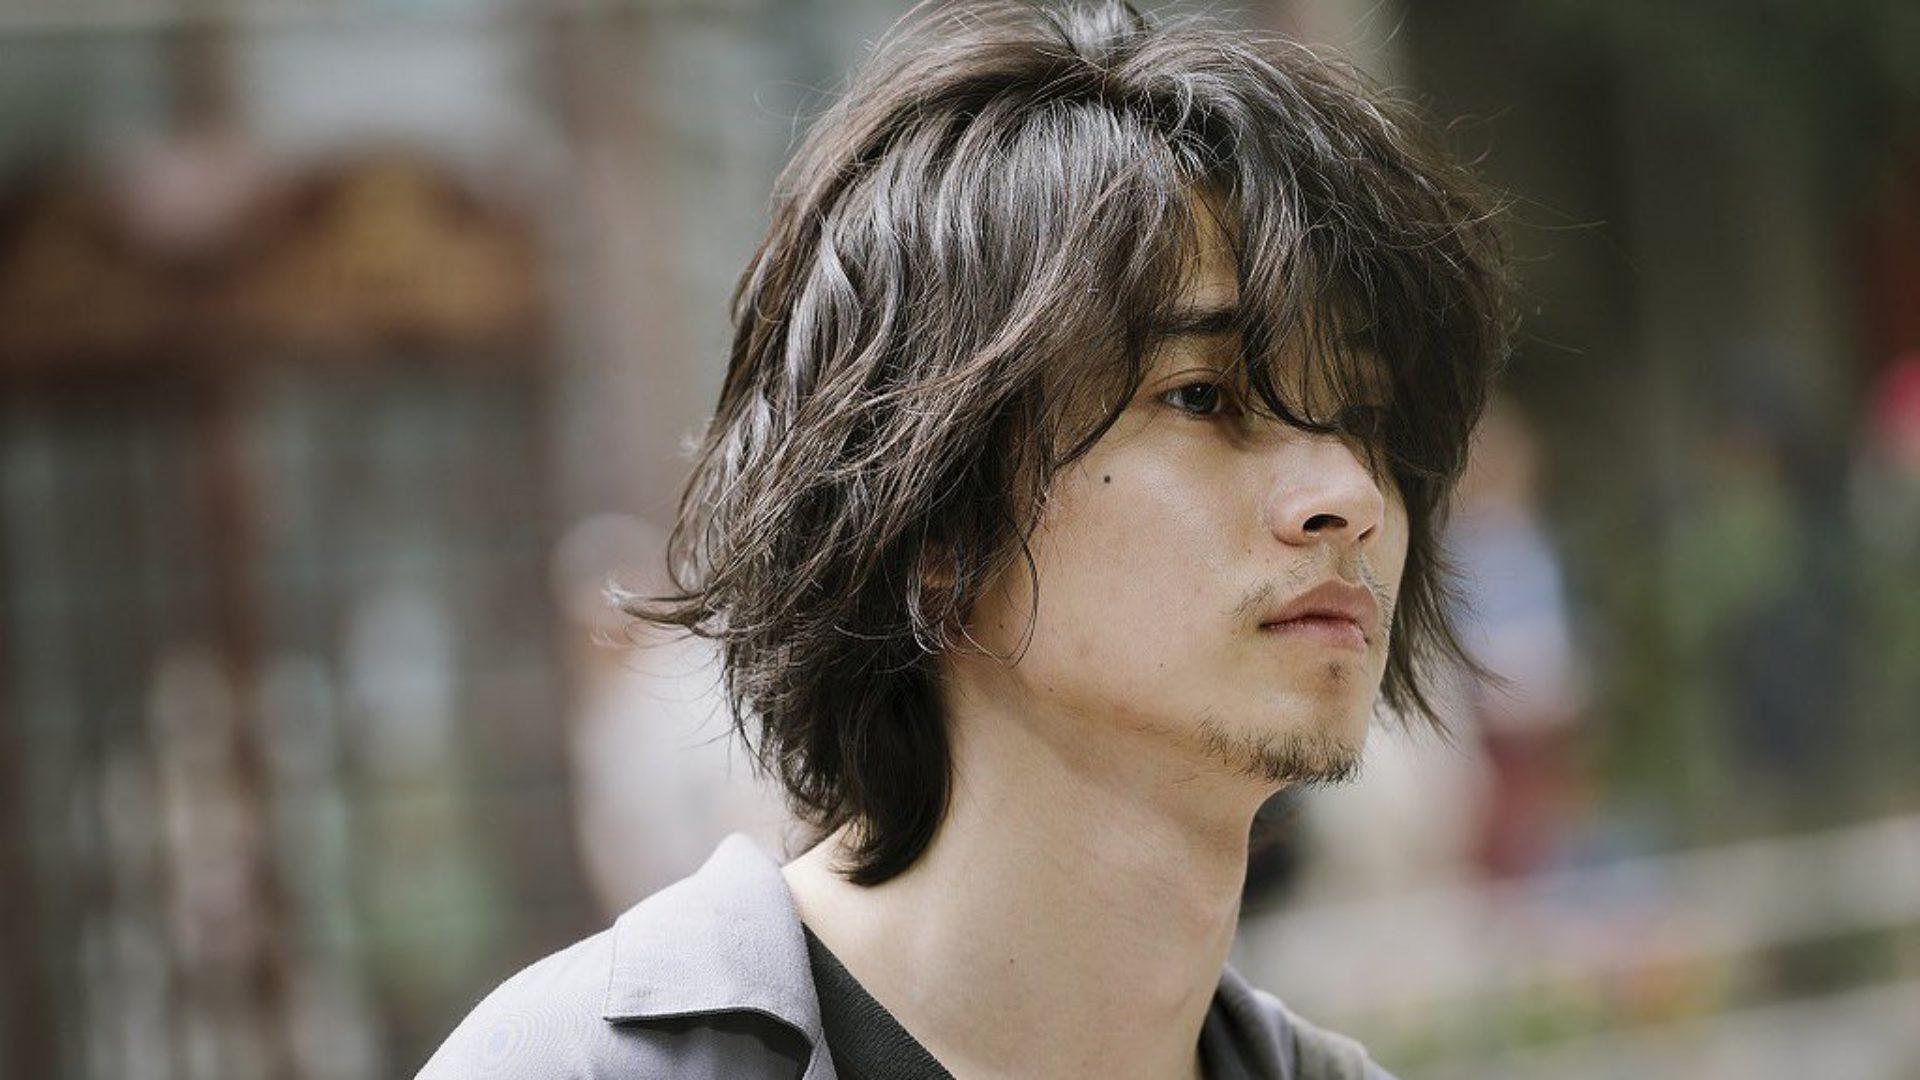 yamazaki-kento.com